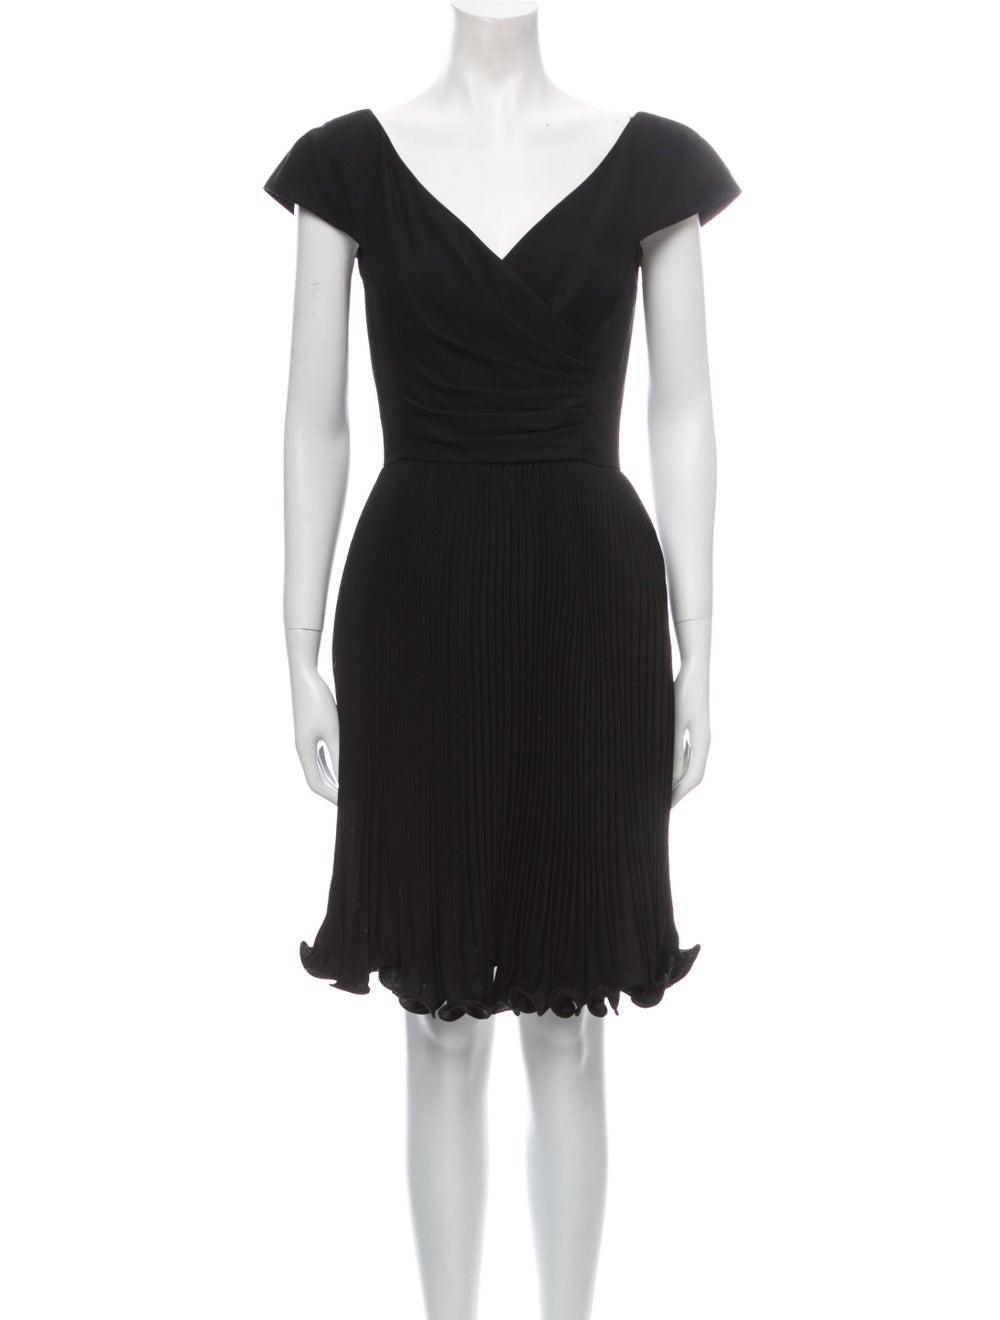 Arnold Scaasi Vintage Knee-Length Dress Black - image 1